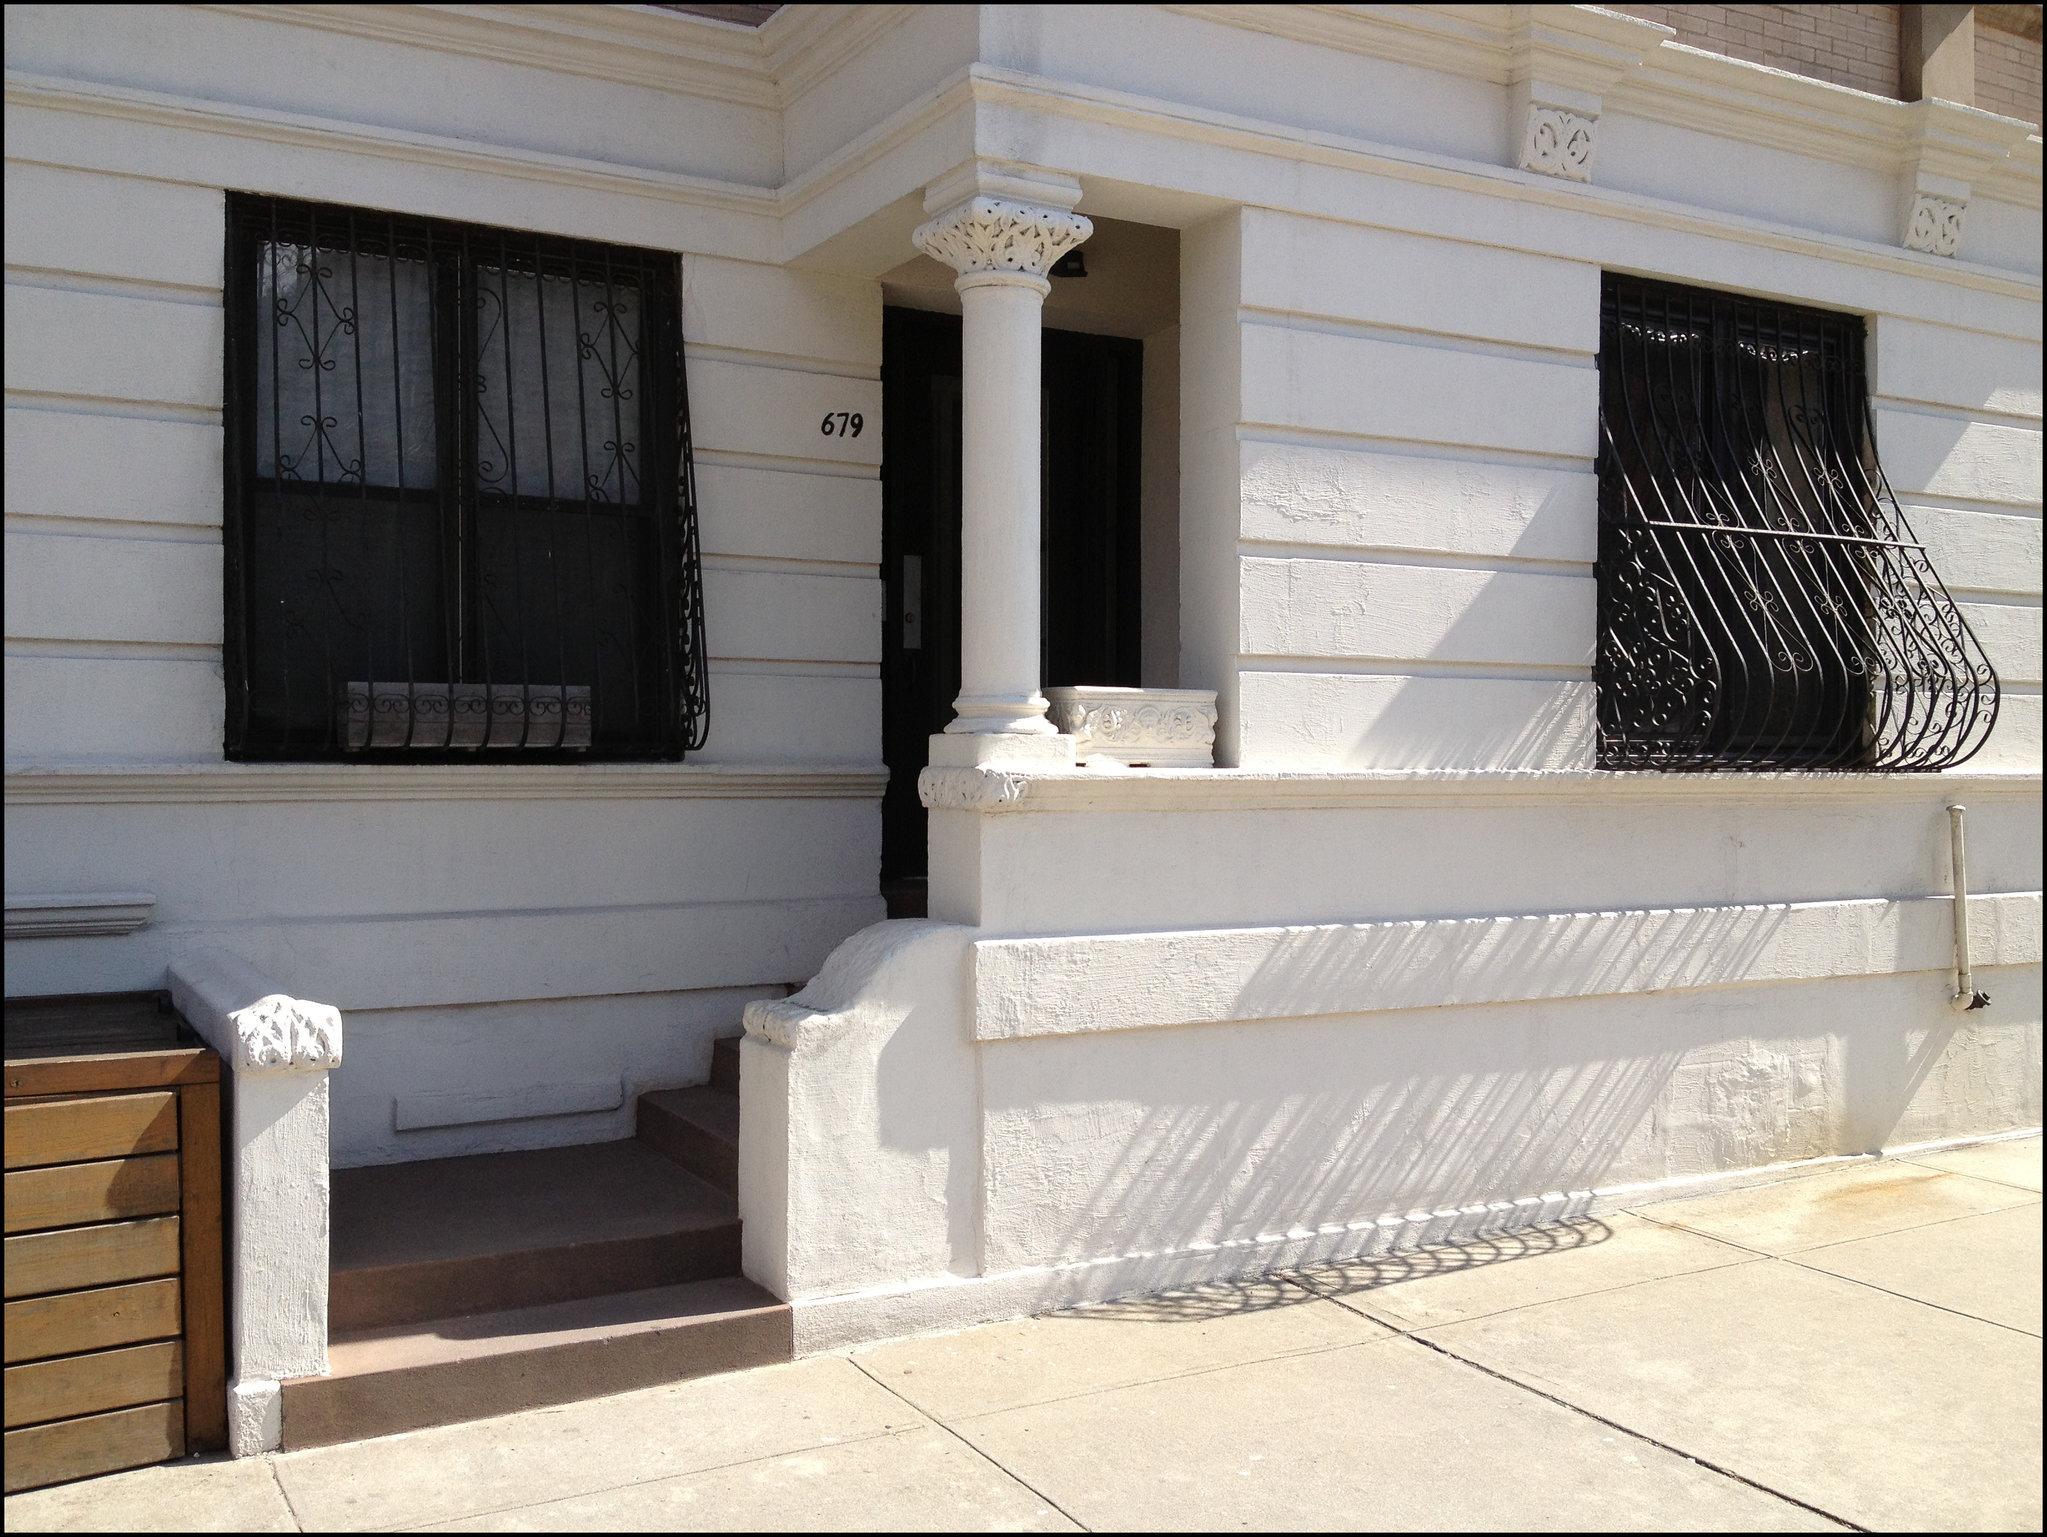 679 Vanderbilt Avenue, Brooklyn, 2013